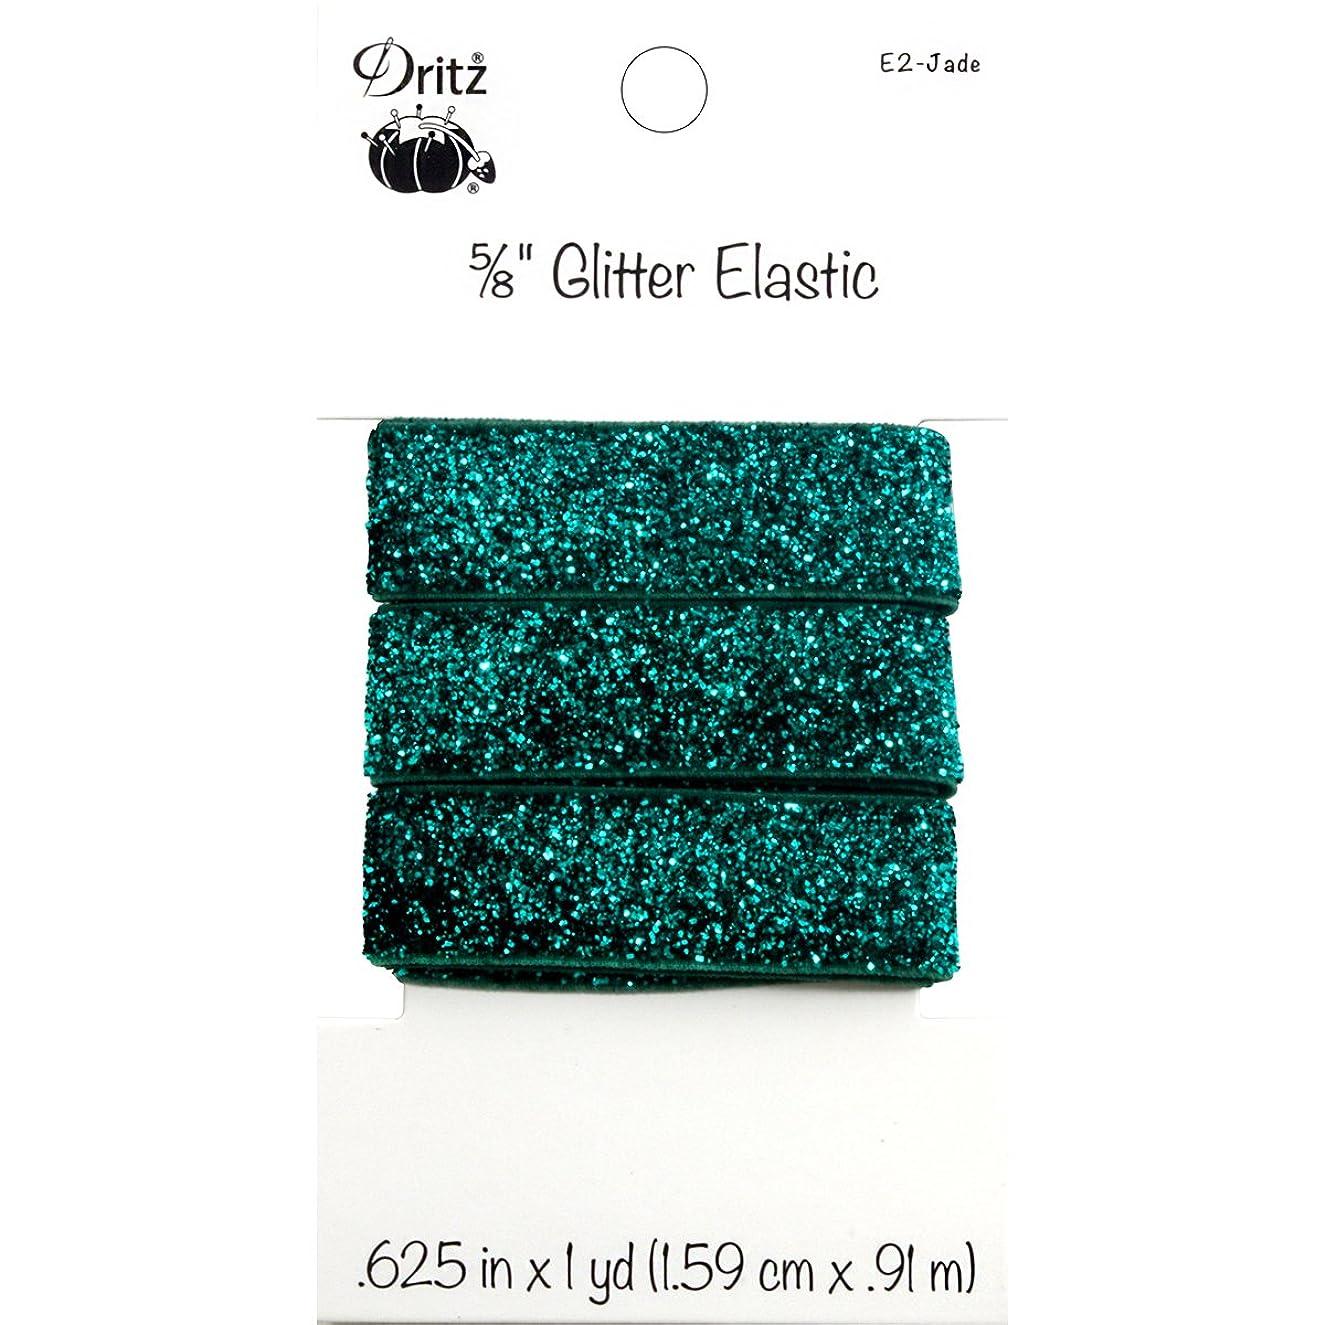 Dritz Glitter Elastic, 5/8-Inch x 1-Yard, Jade